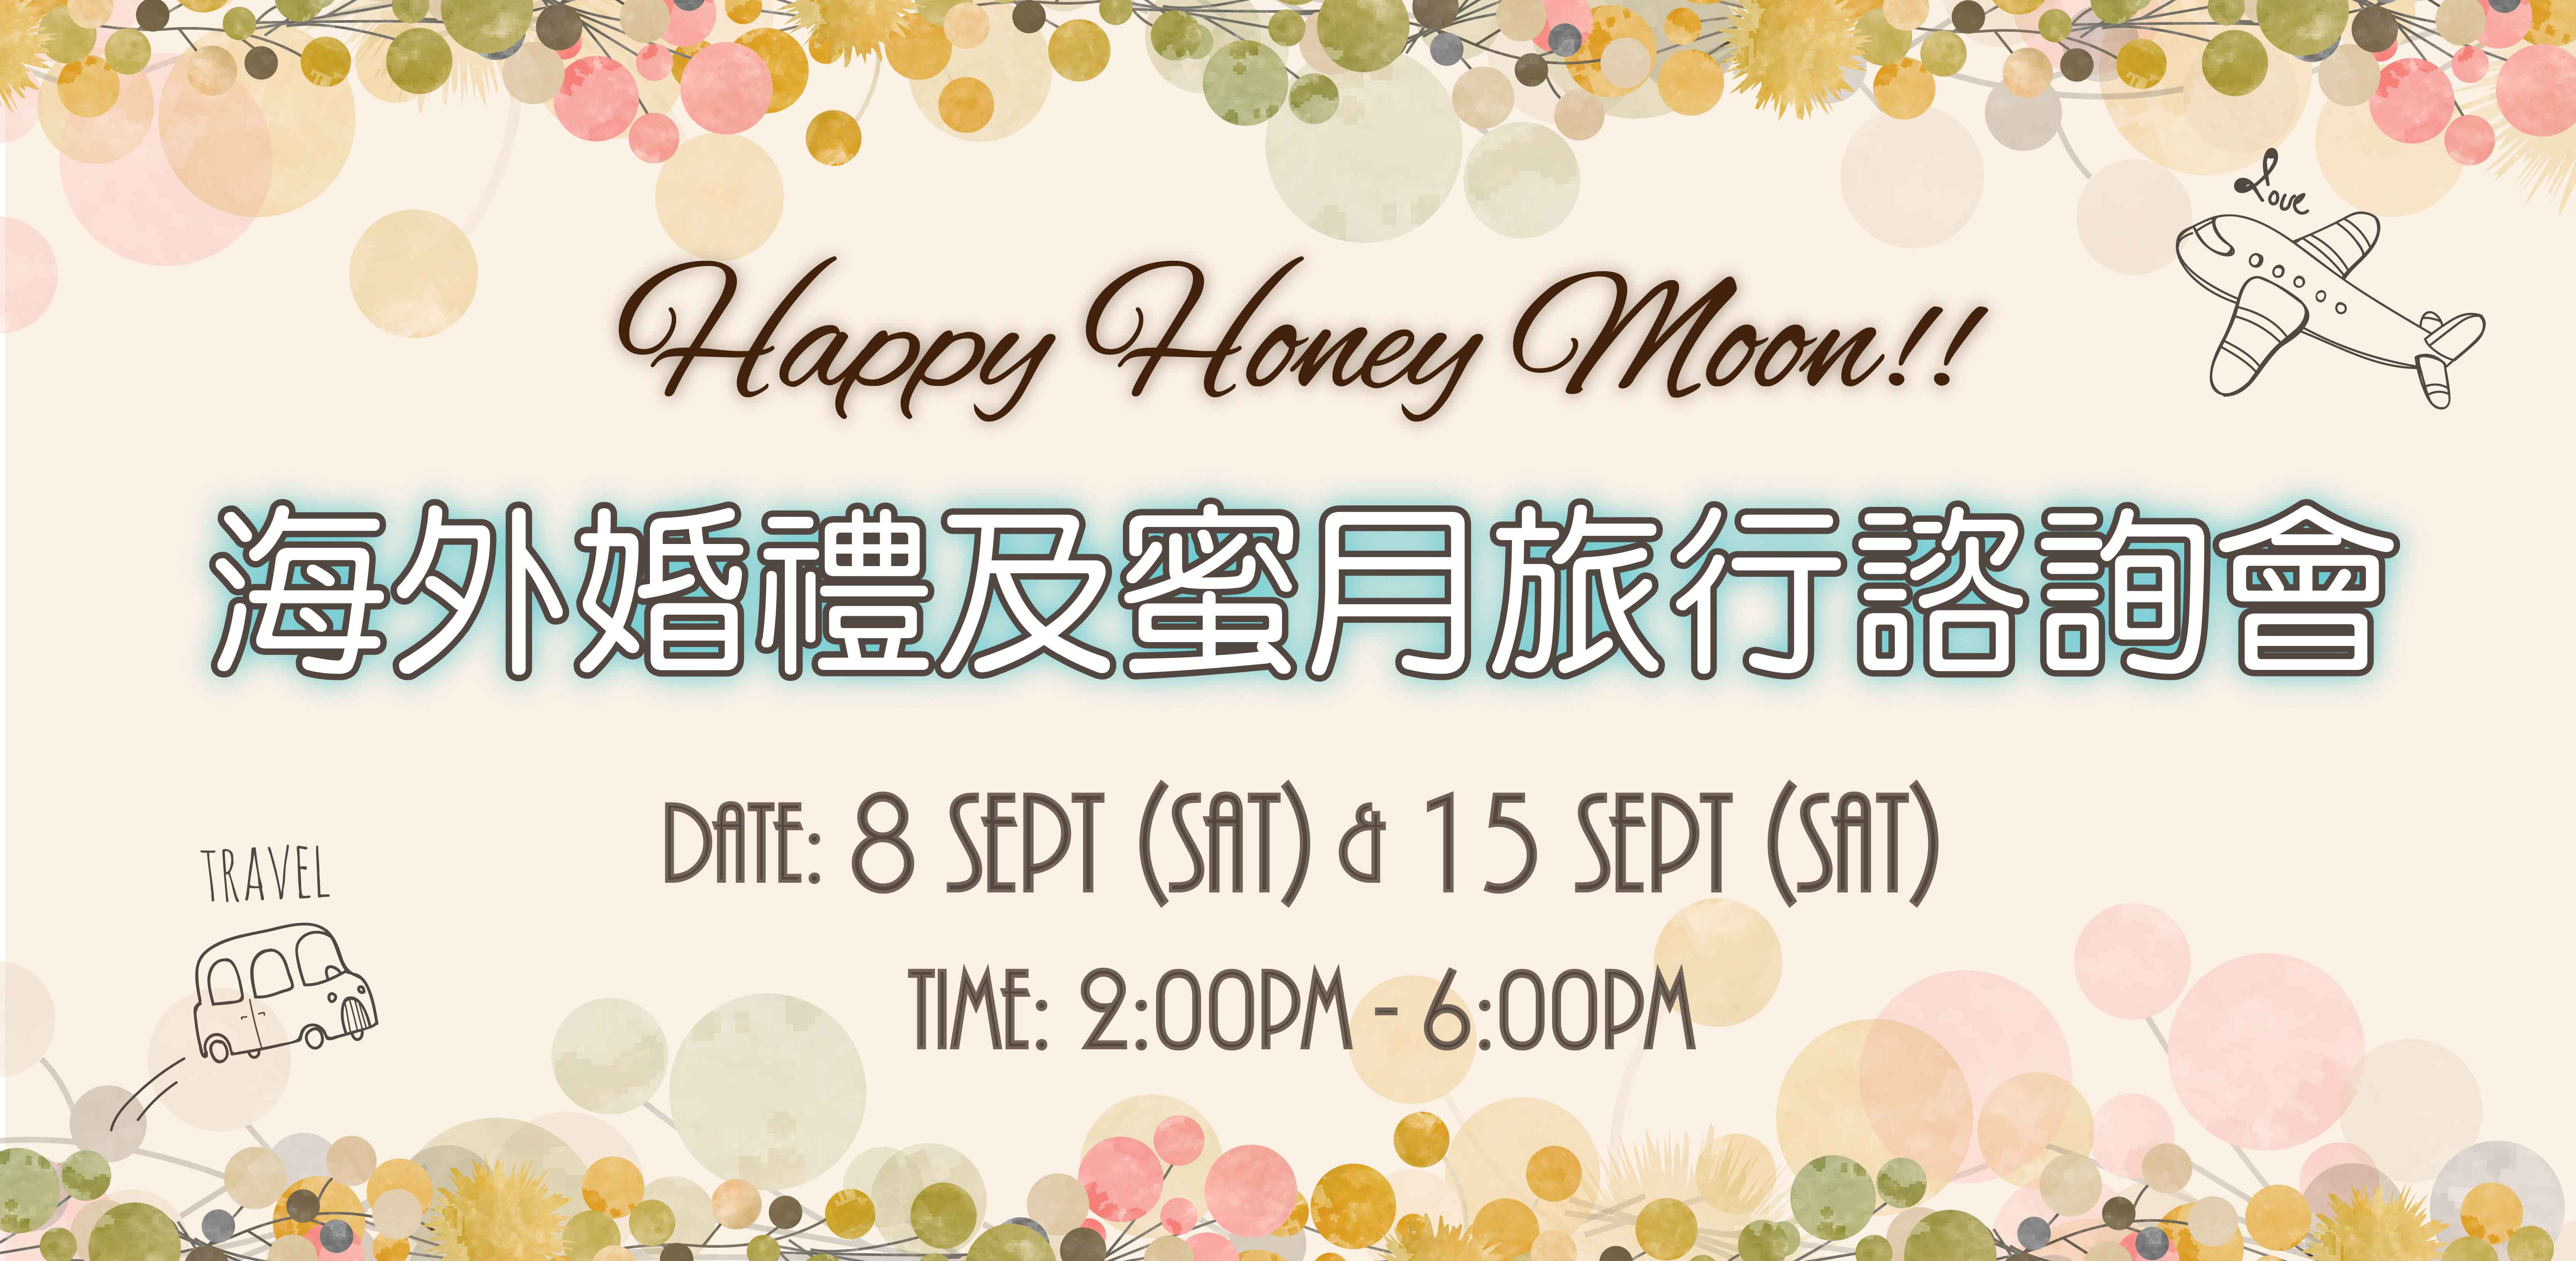 Happy HoneyMoon!! 海外婚禮及蜜月旅行諮詢會